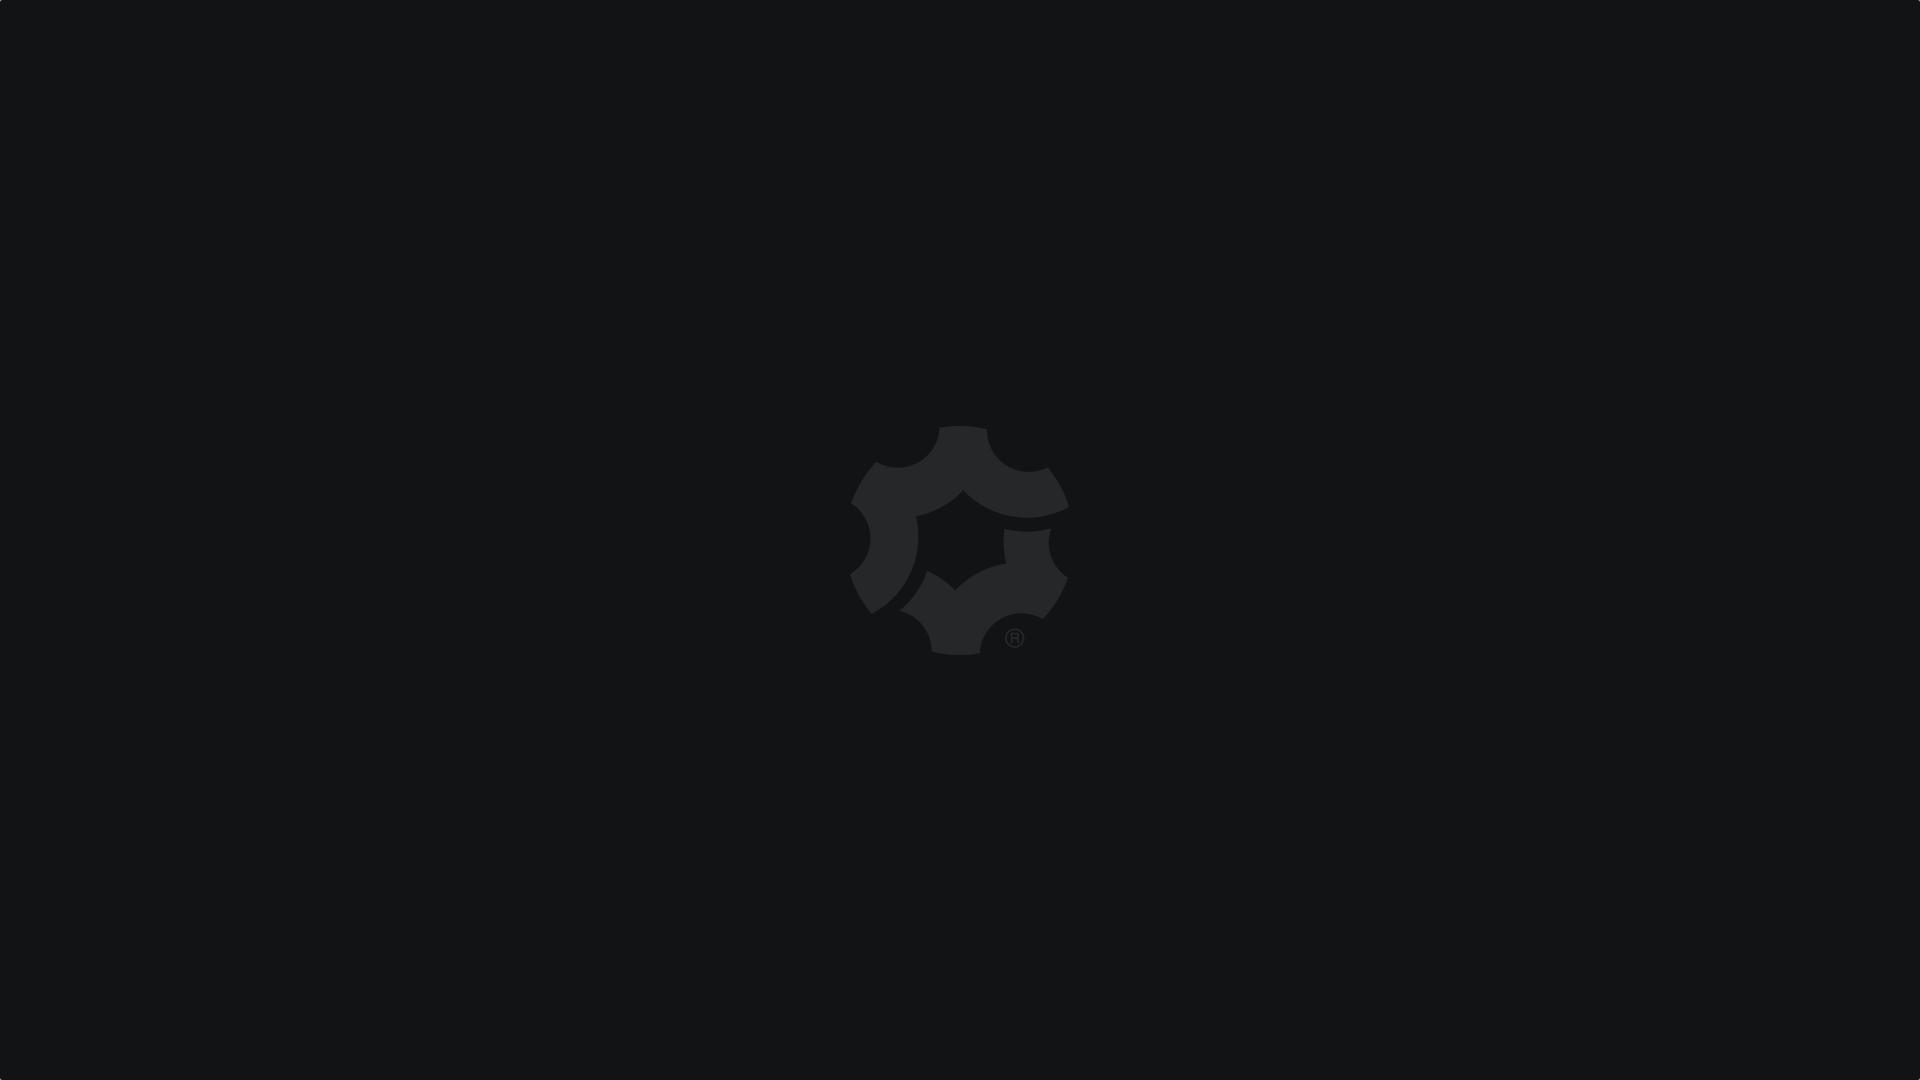 triggersymbol